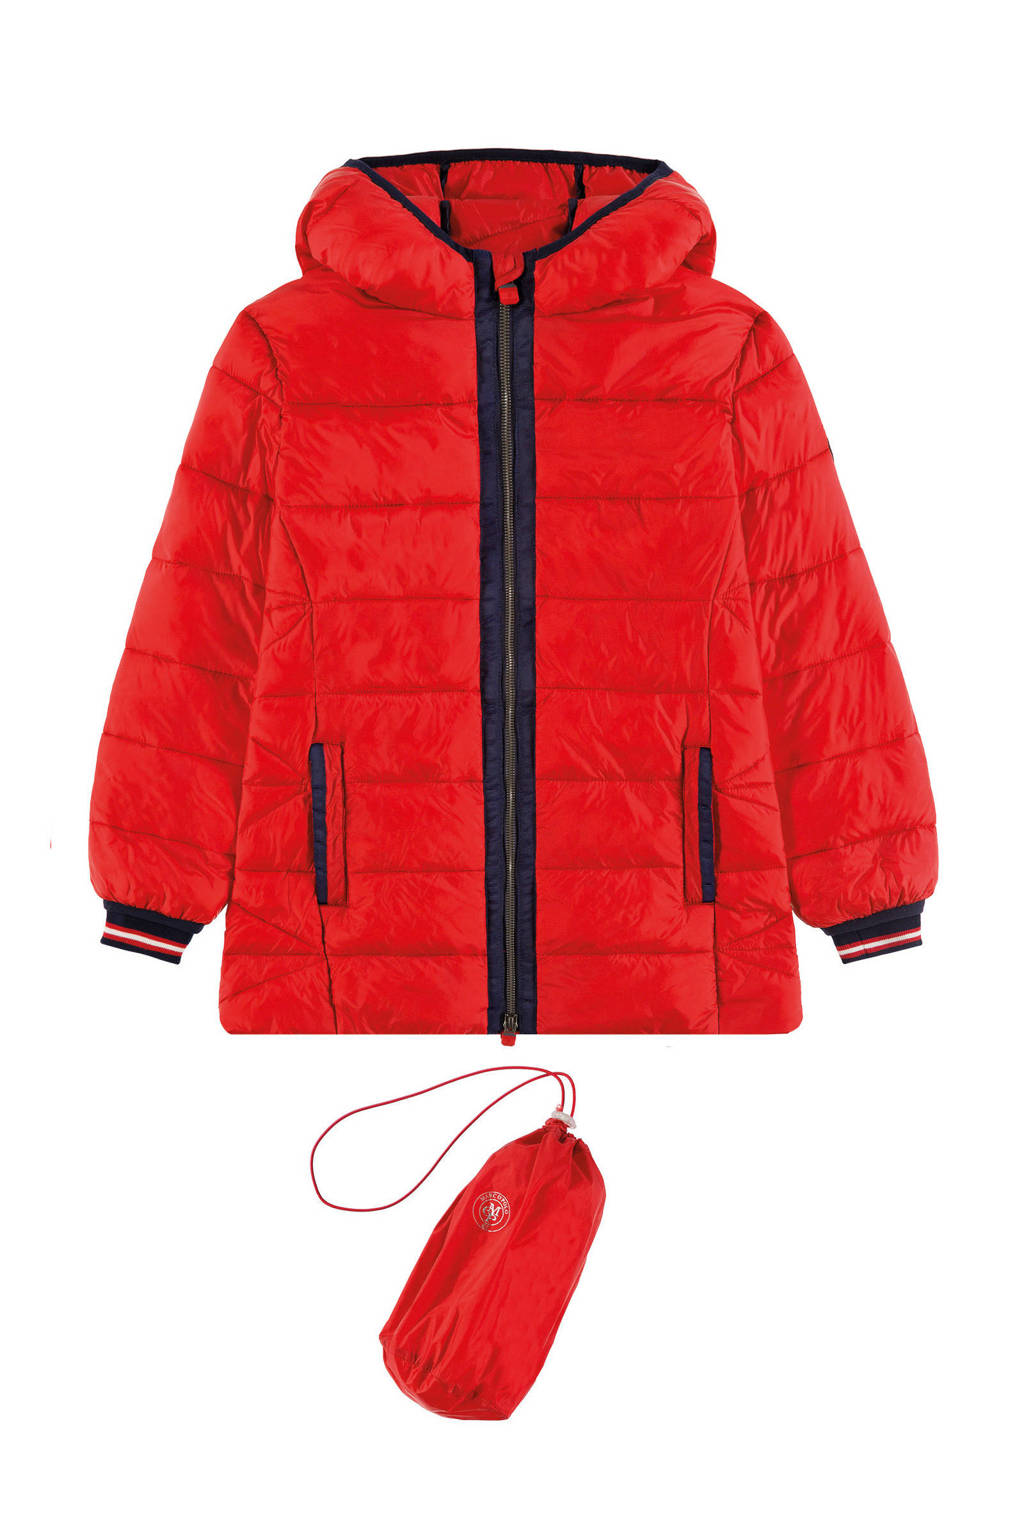 Marc O'Polo winterjas rood/zwart, Rood/zwart